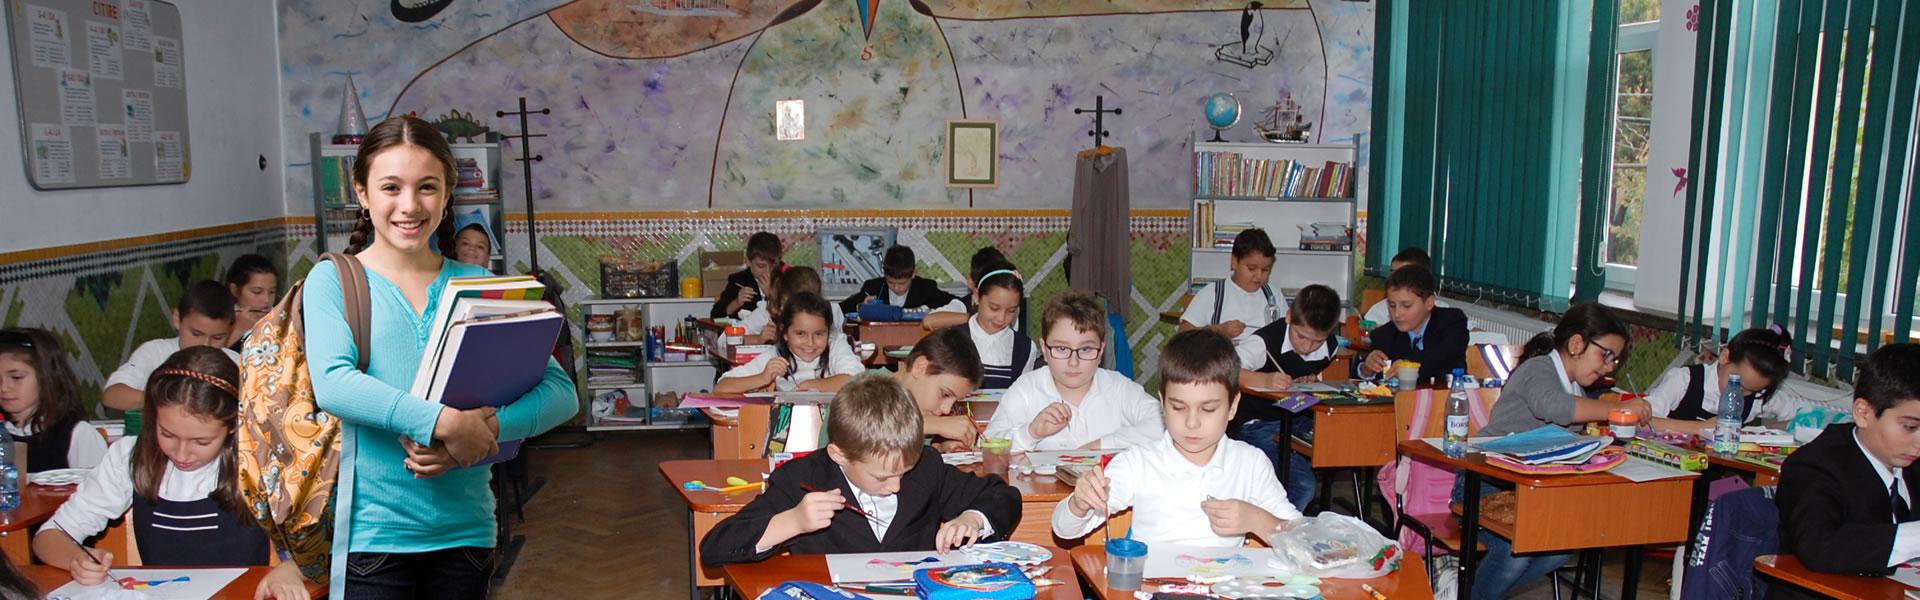 Clasa elevi la scoala Gimnaziala Ion Bancila